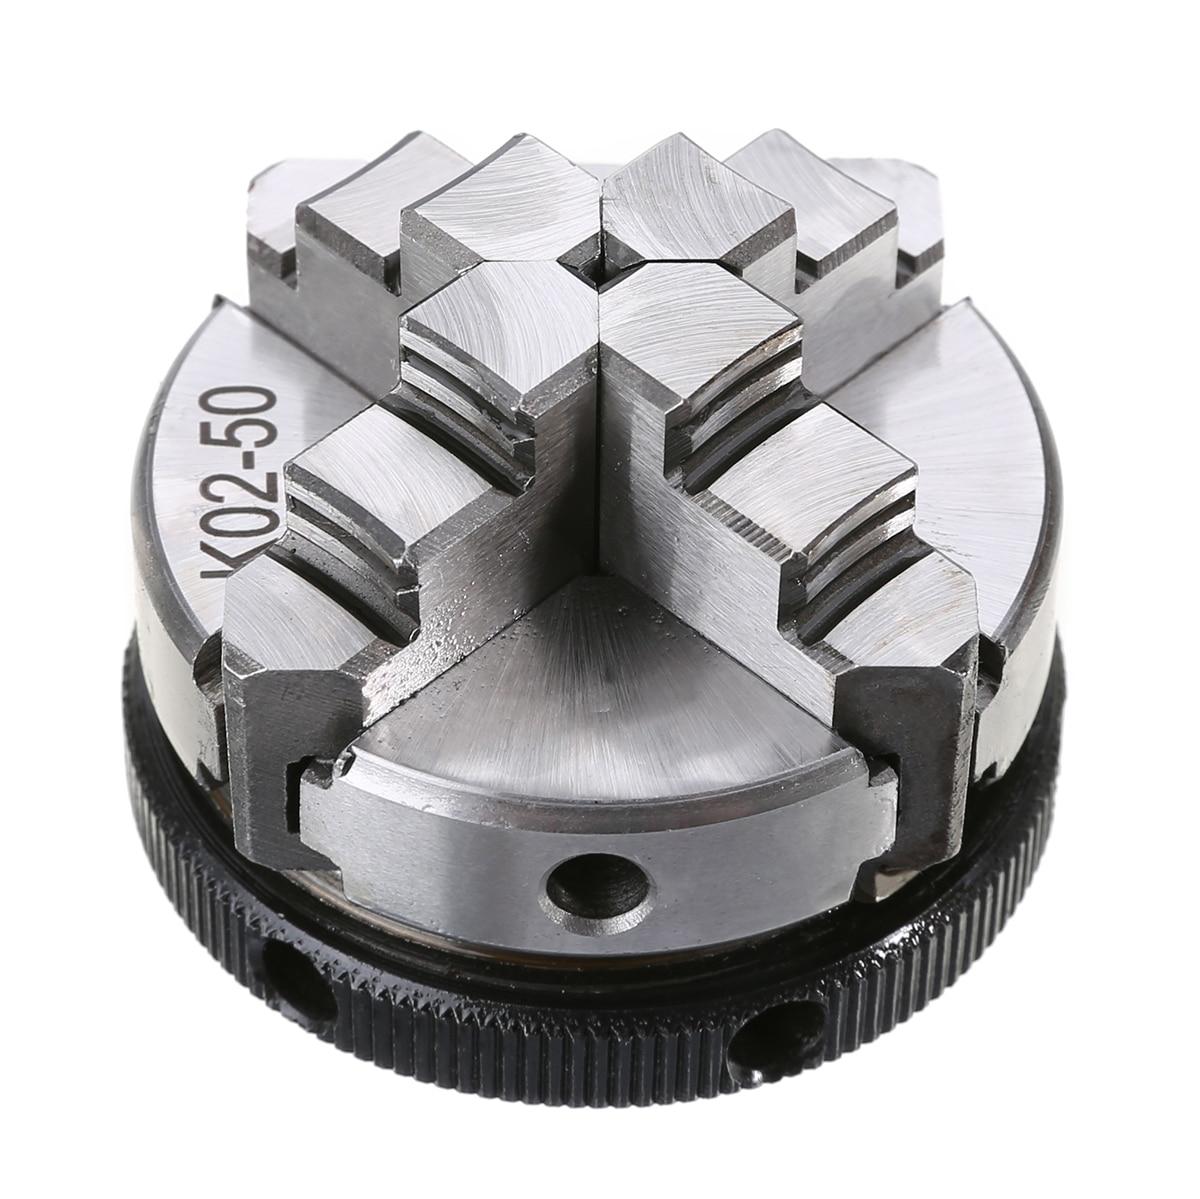 Mini K02-50 4 Jaw Lathe Chuck 2 inch M14 Self-Centering Thread Mount with 2pcs Lock Rod with High Hardness velas k 02